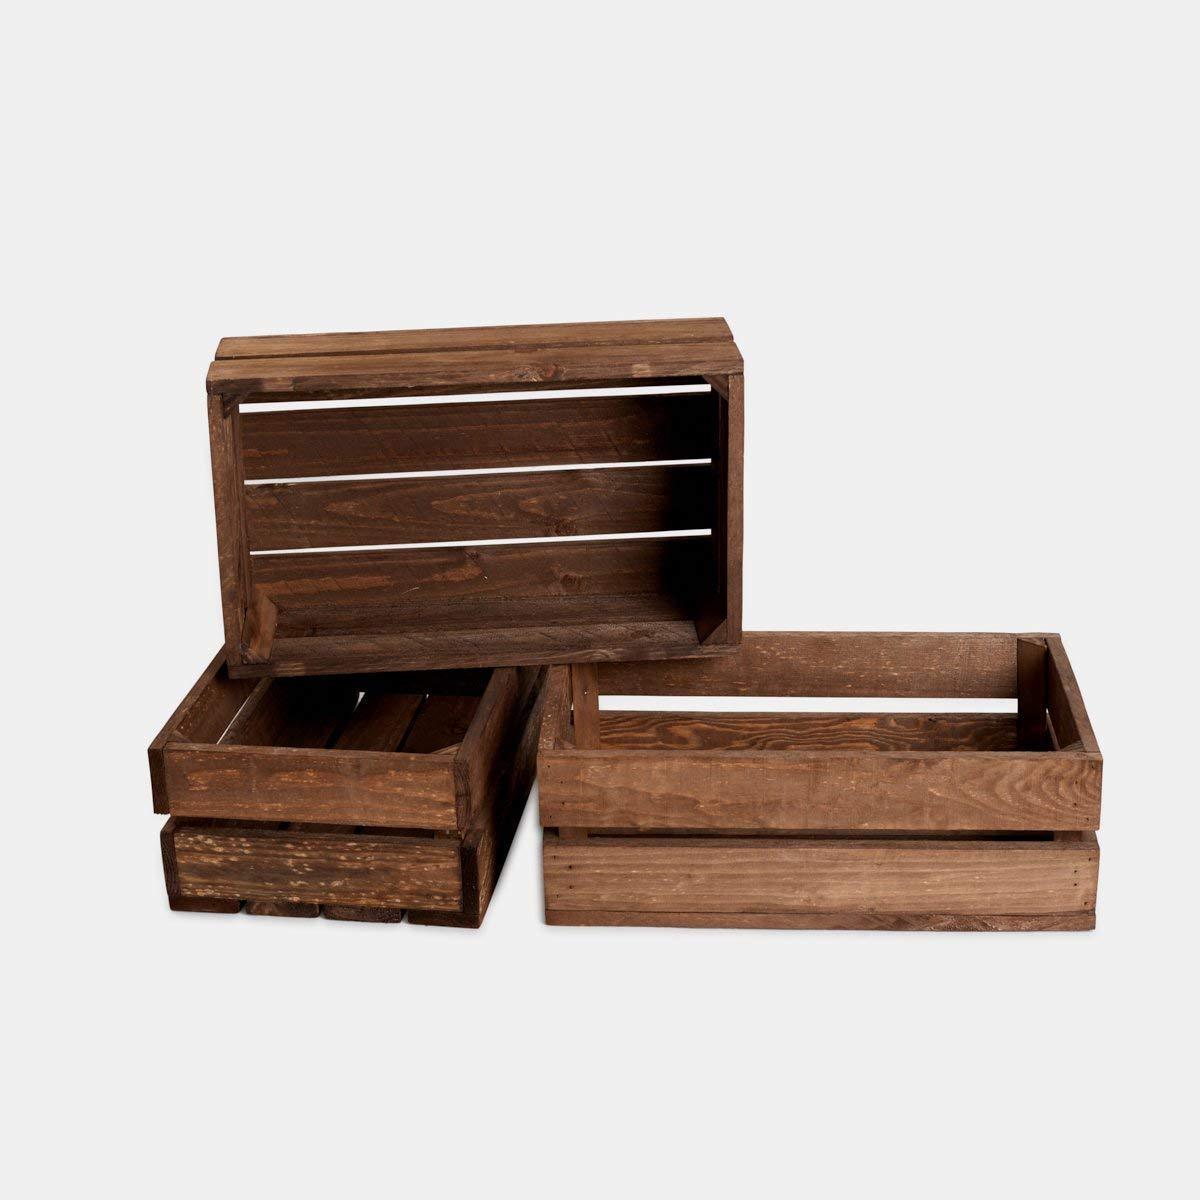 Rebaja oferta lote set juego 3 cajas cajón caja cajones frutas madera tono envejecido 50x30x17 cm 1,4 grosor ideal para decoracion,estanteria. regalo, fabricadas artesanalmente handmade